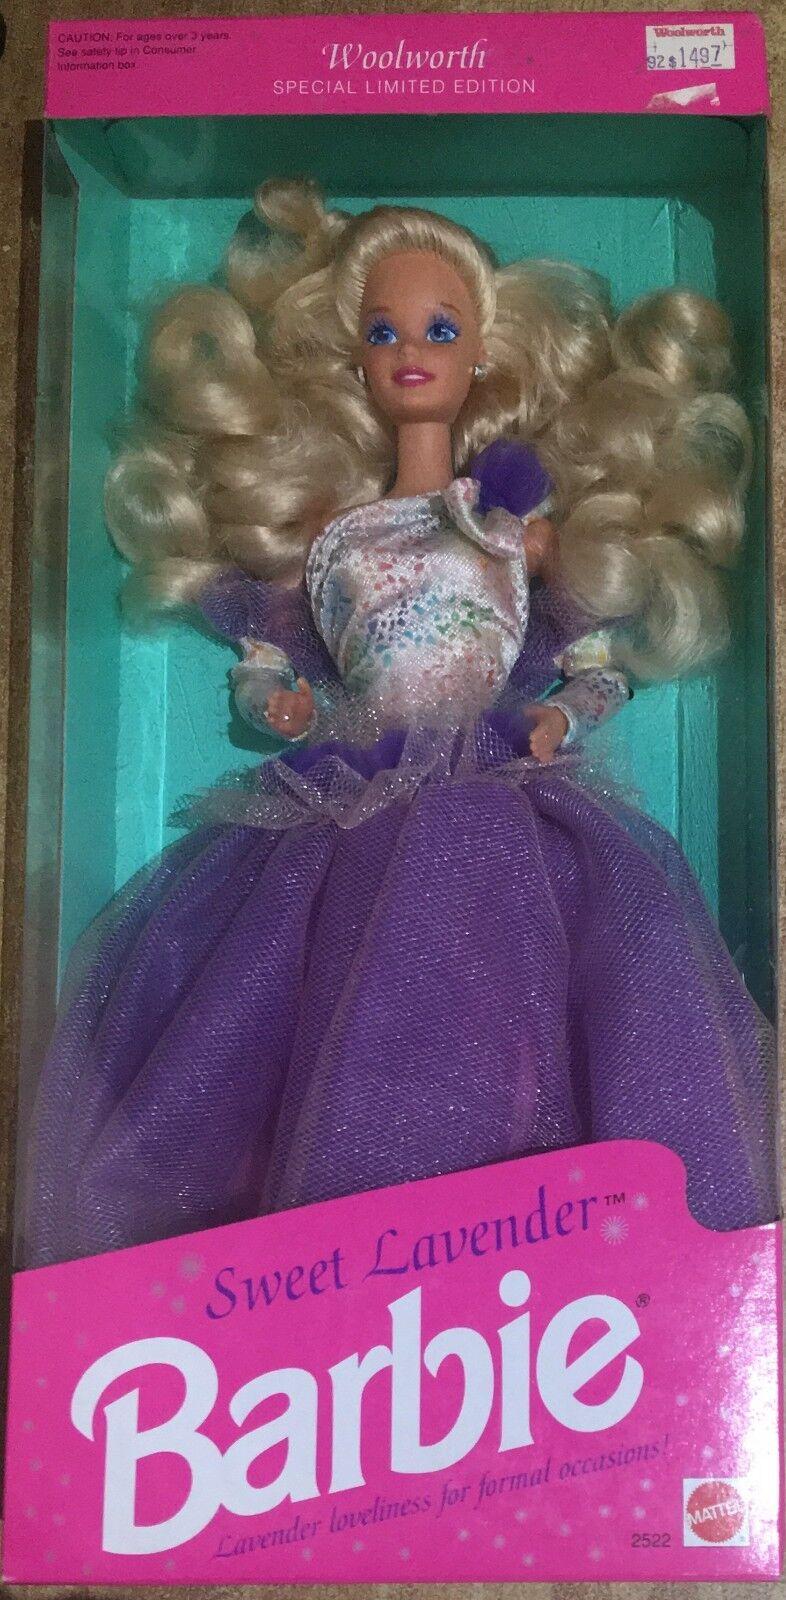 Barbie Mattel Sweet Lavander Woolworth Special Limited Edition 92'